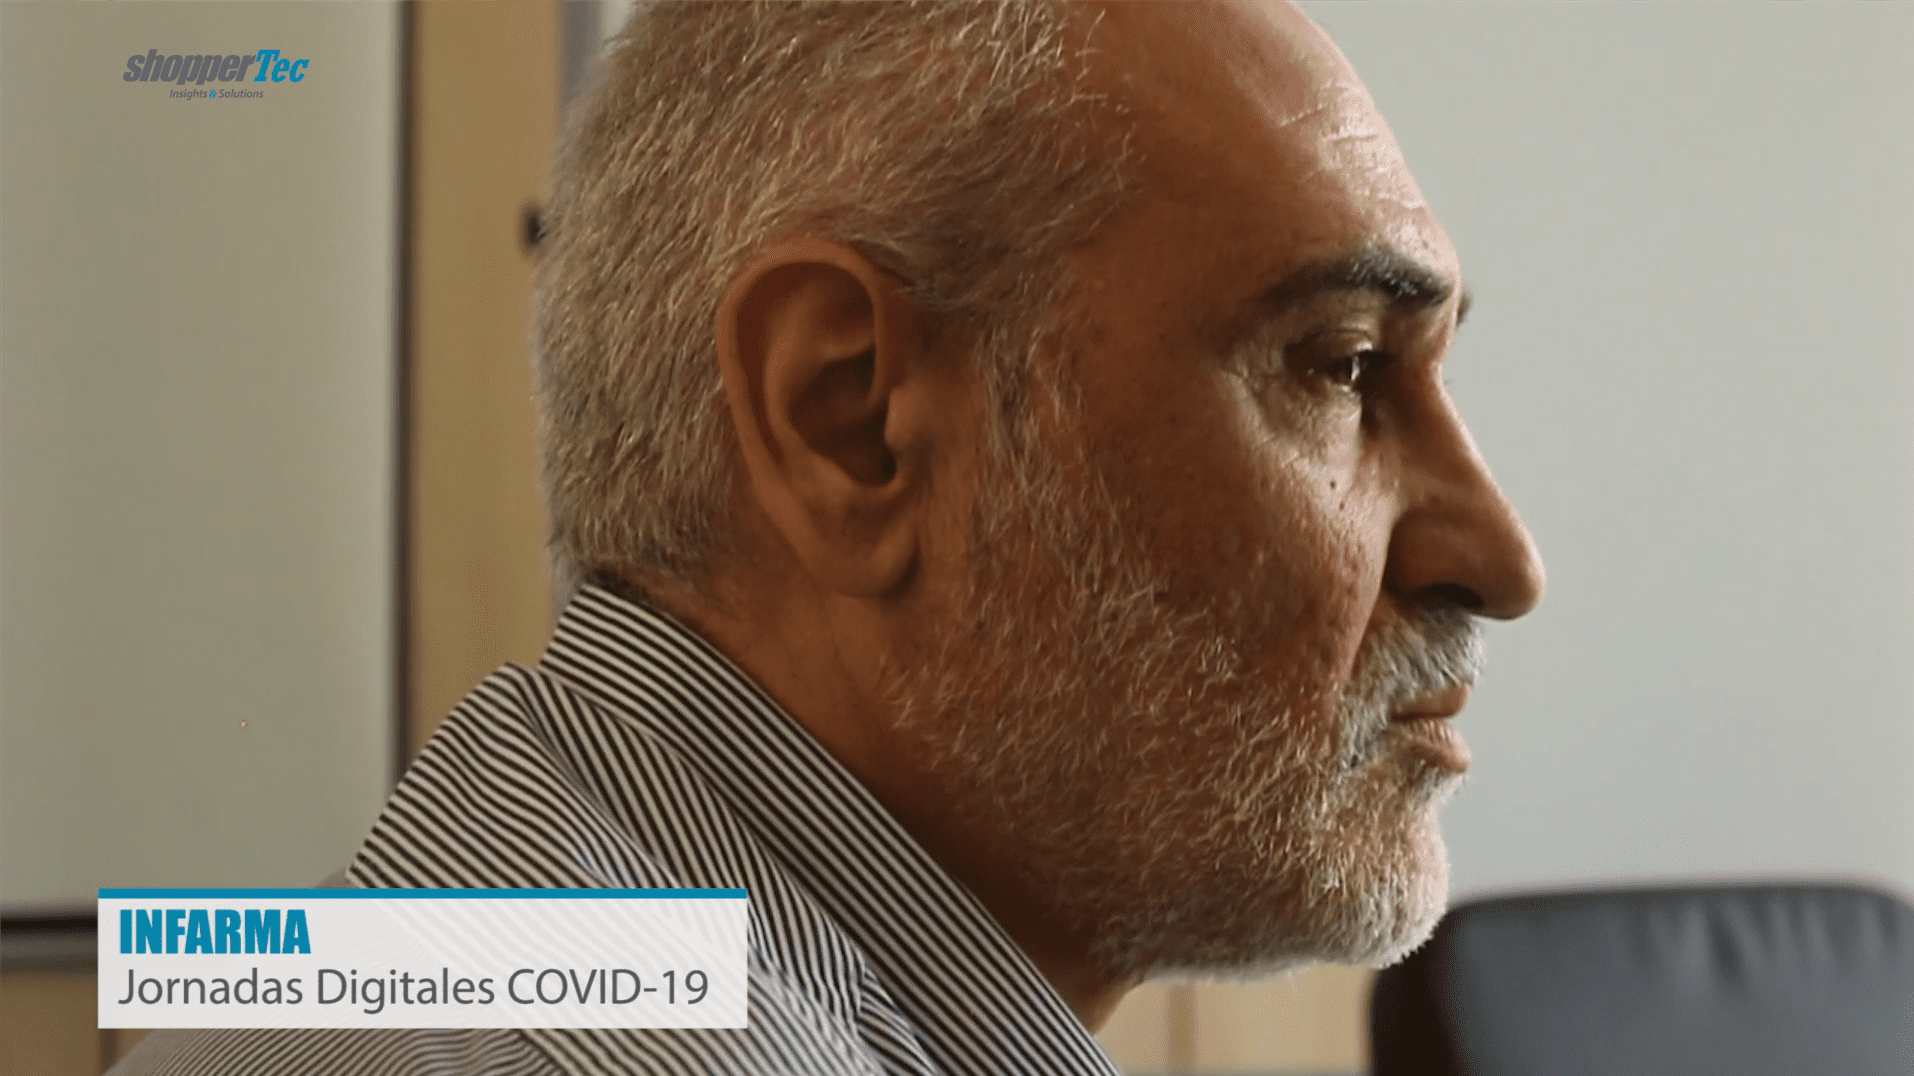 Infarma Jornadas Digitales COVID-19